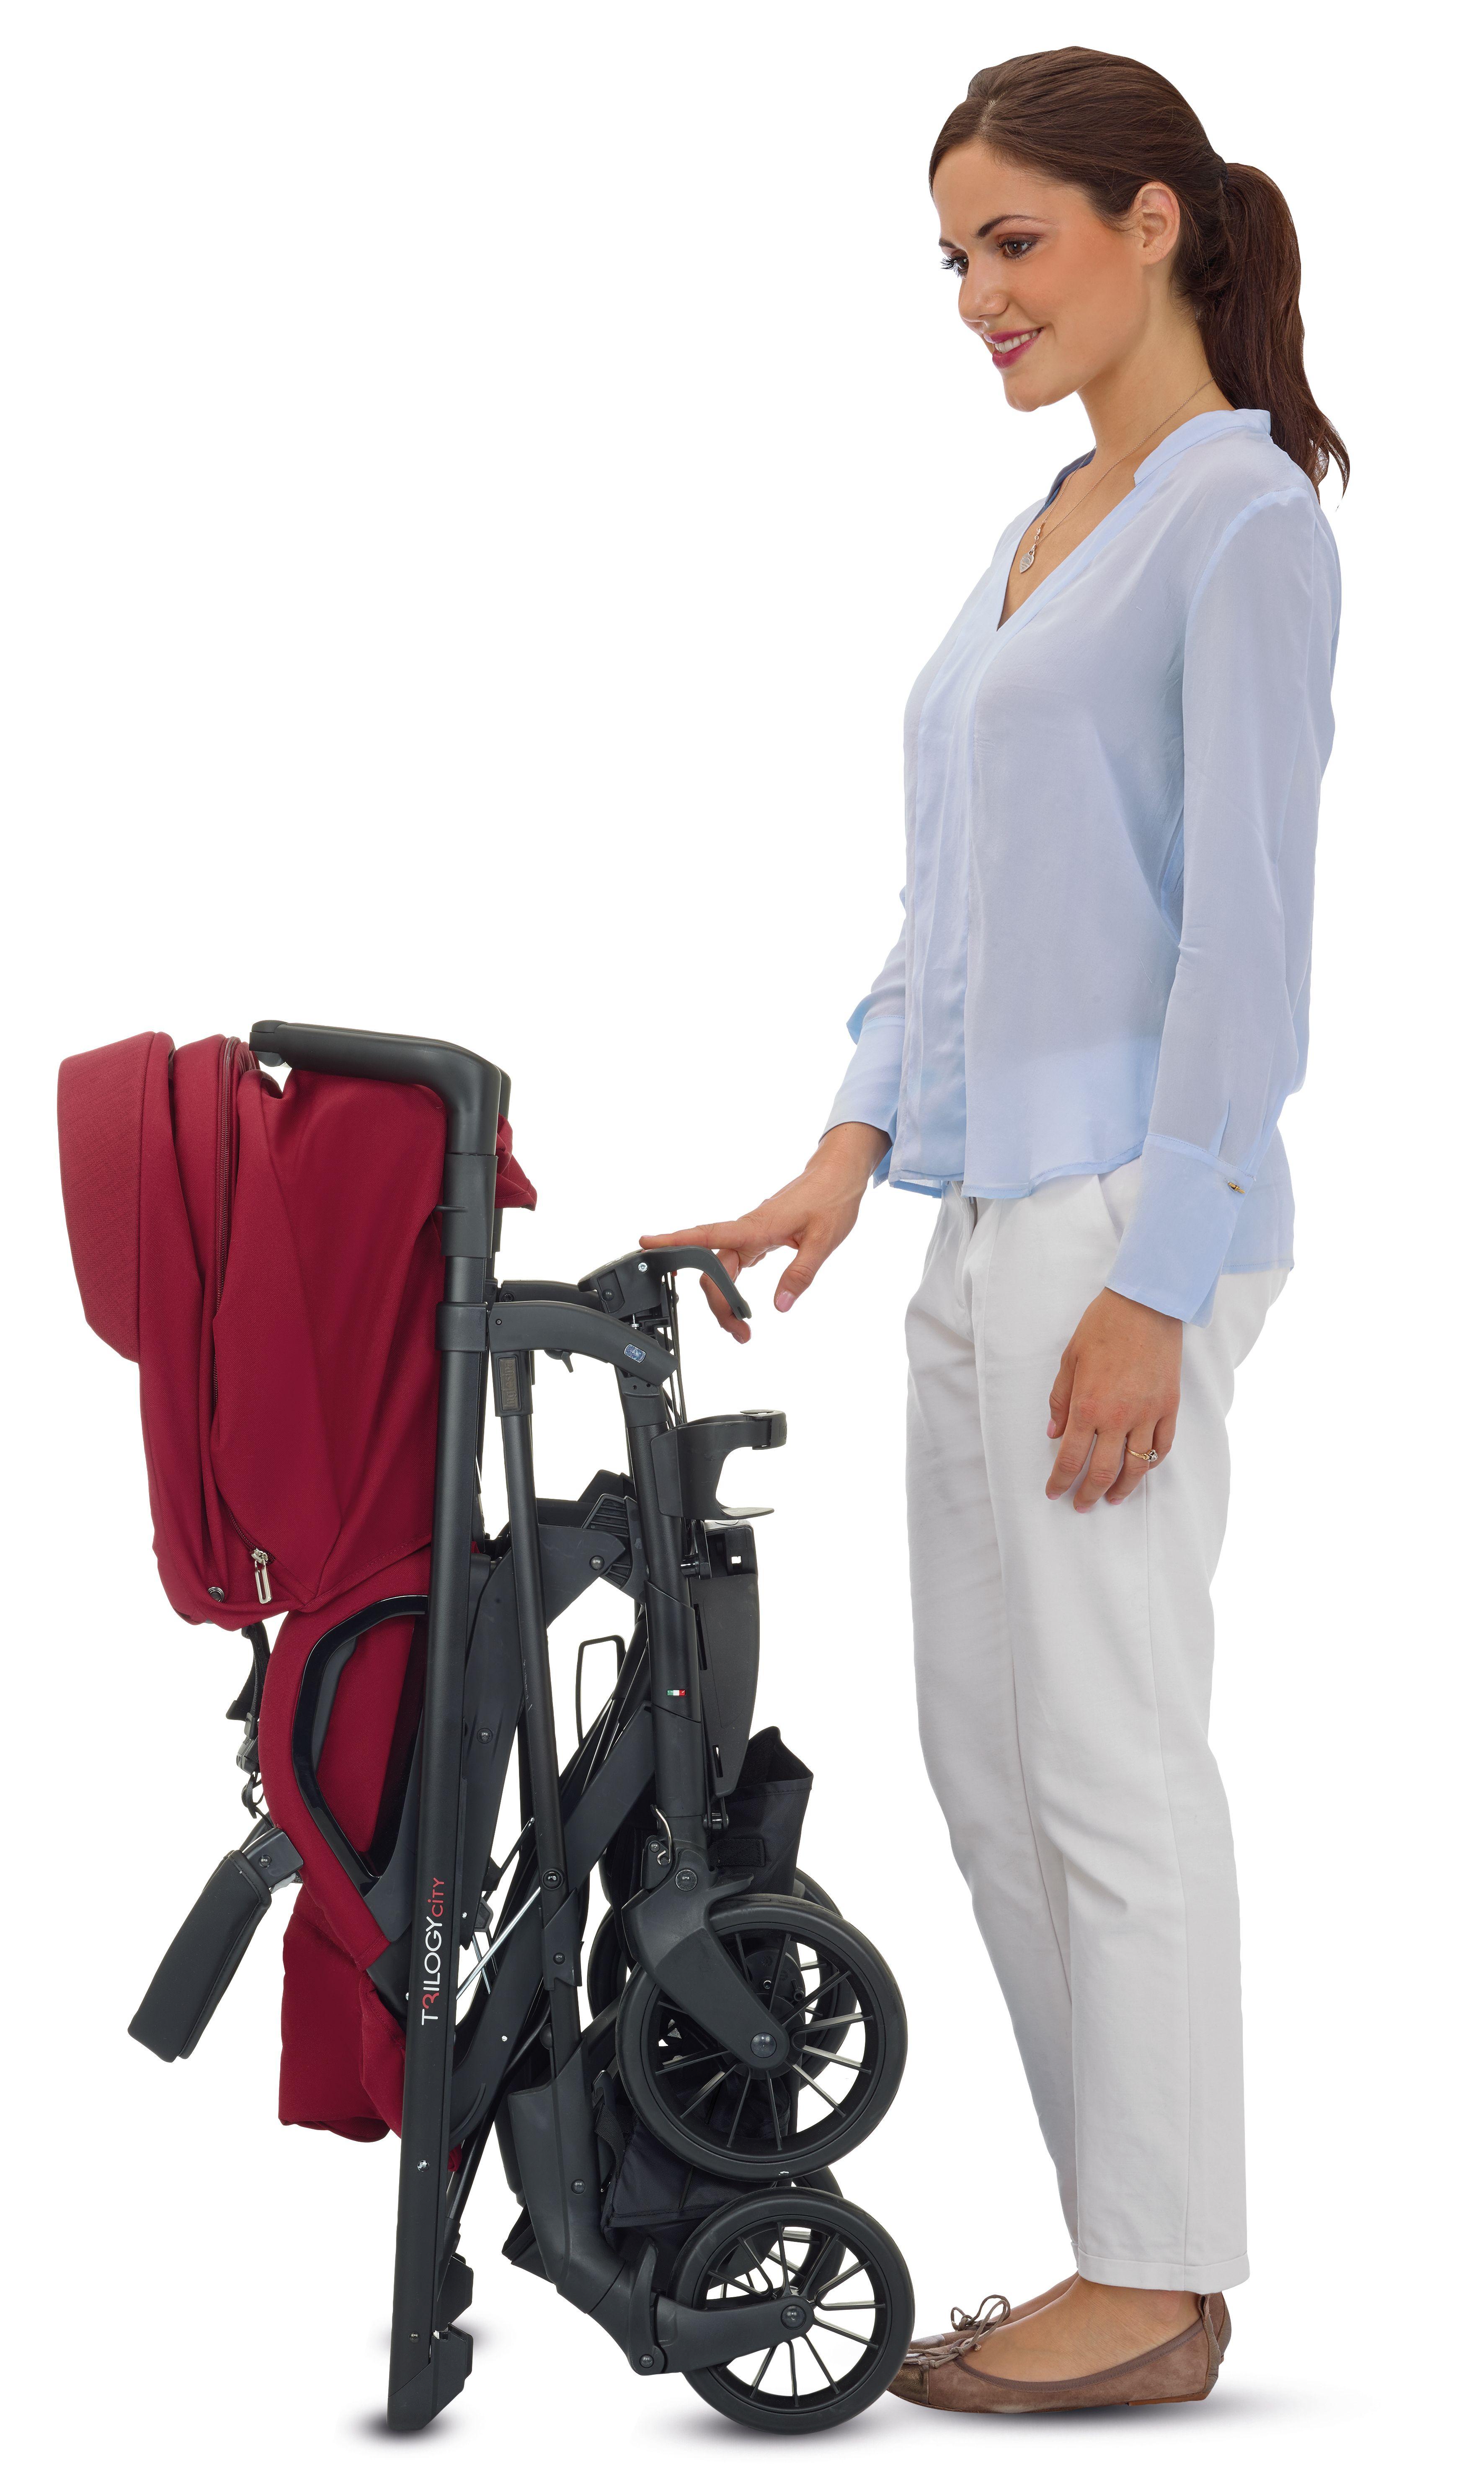 Trilogy Stroller Closing 2/2 Stroller, Baby strollers